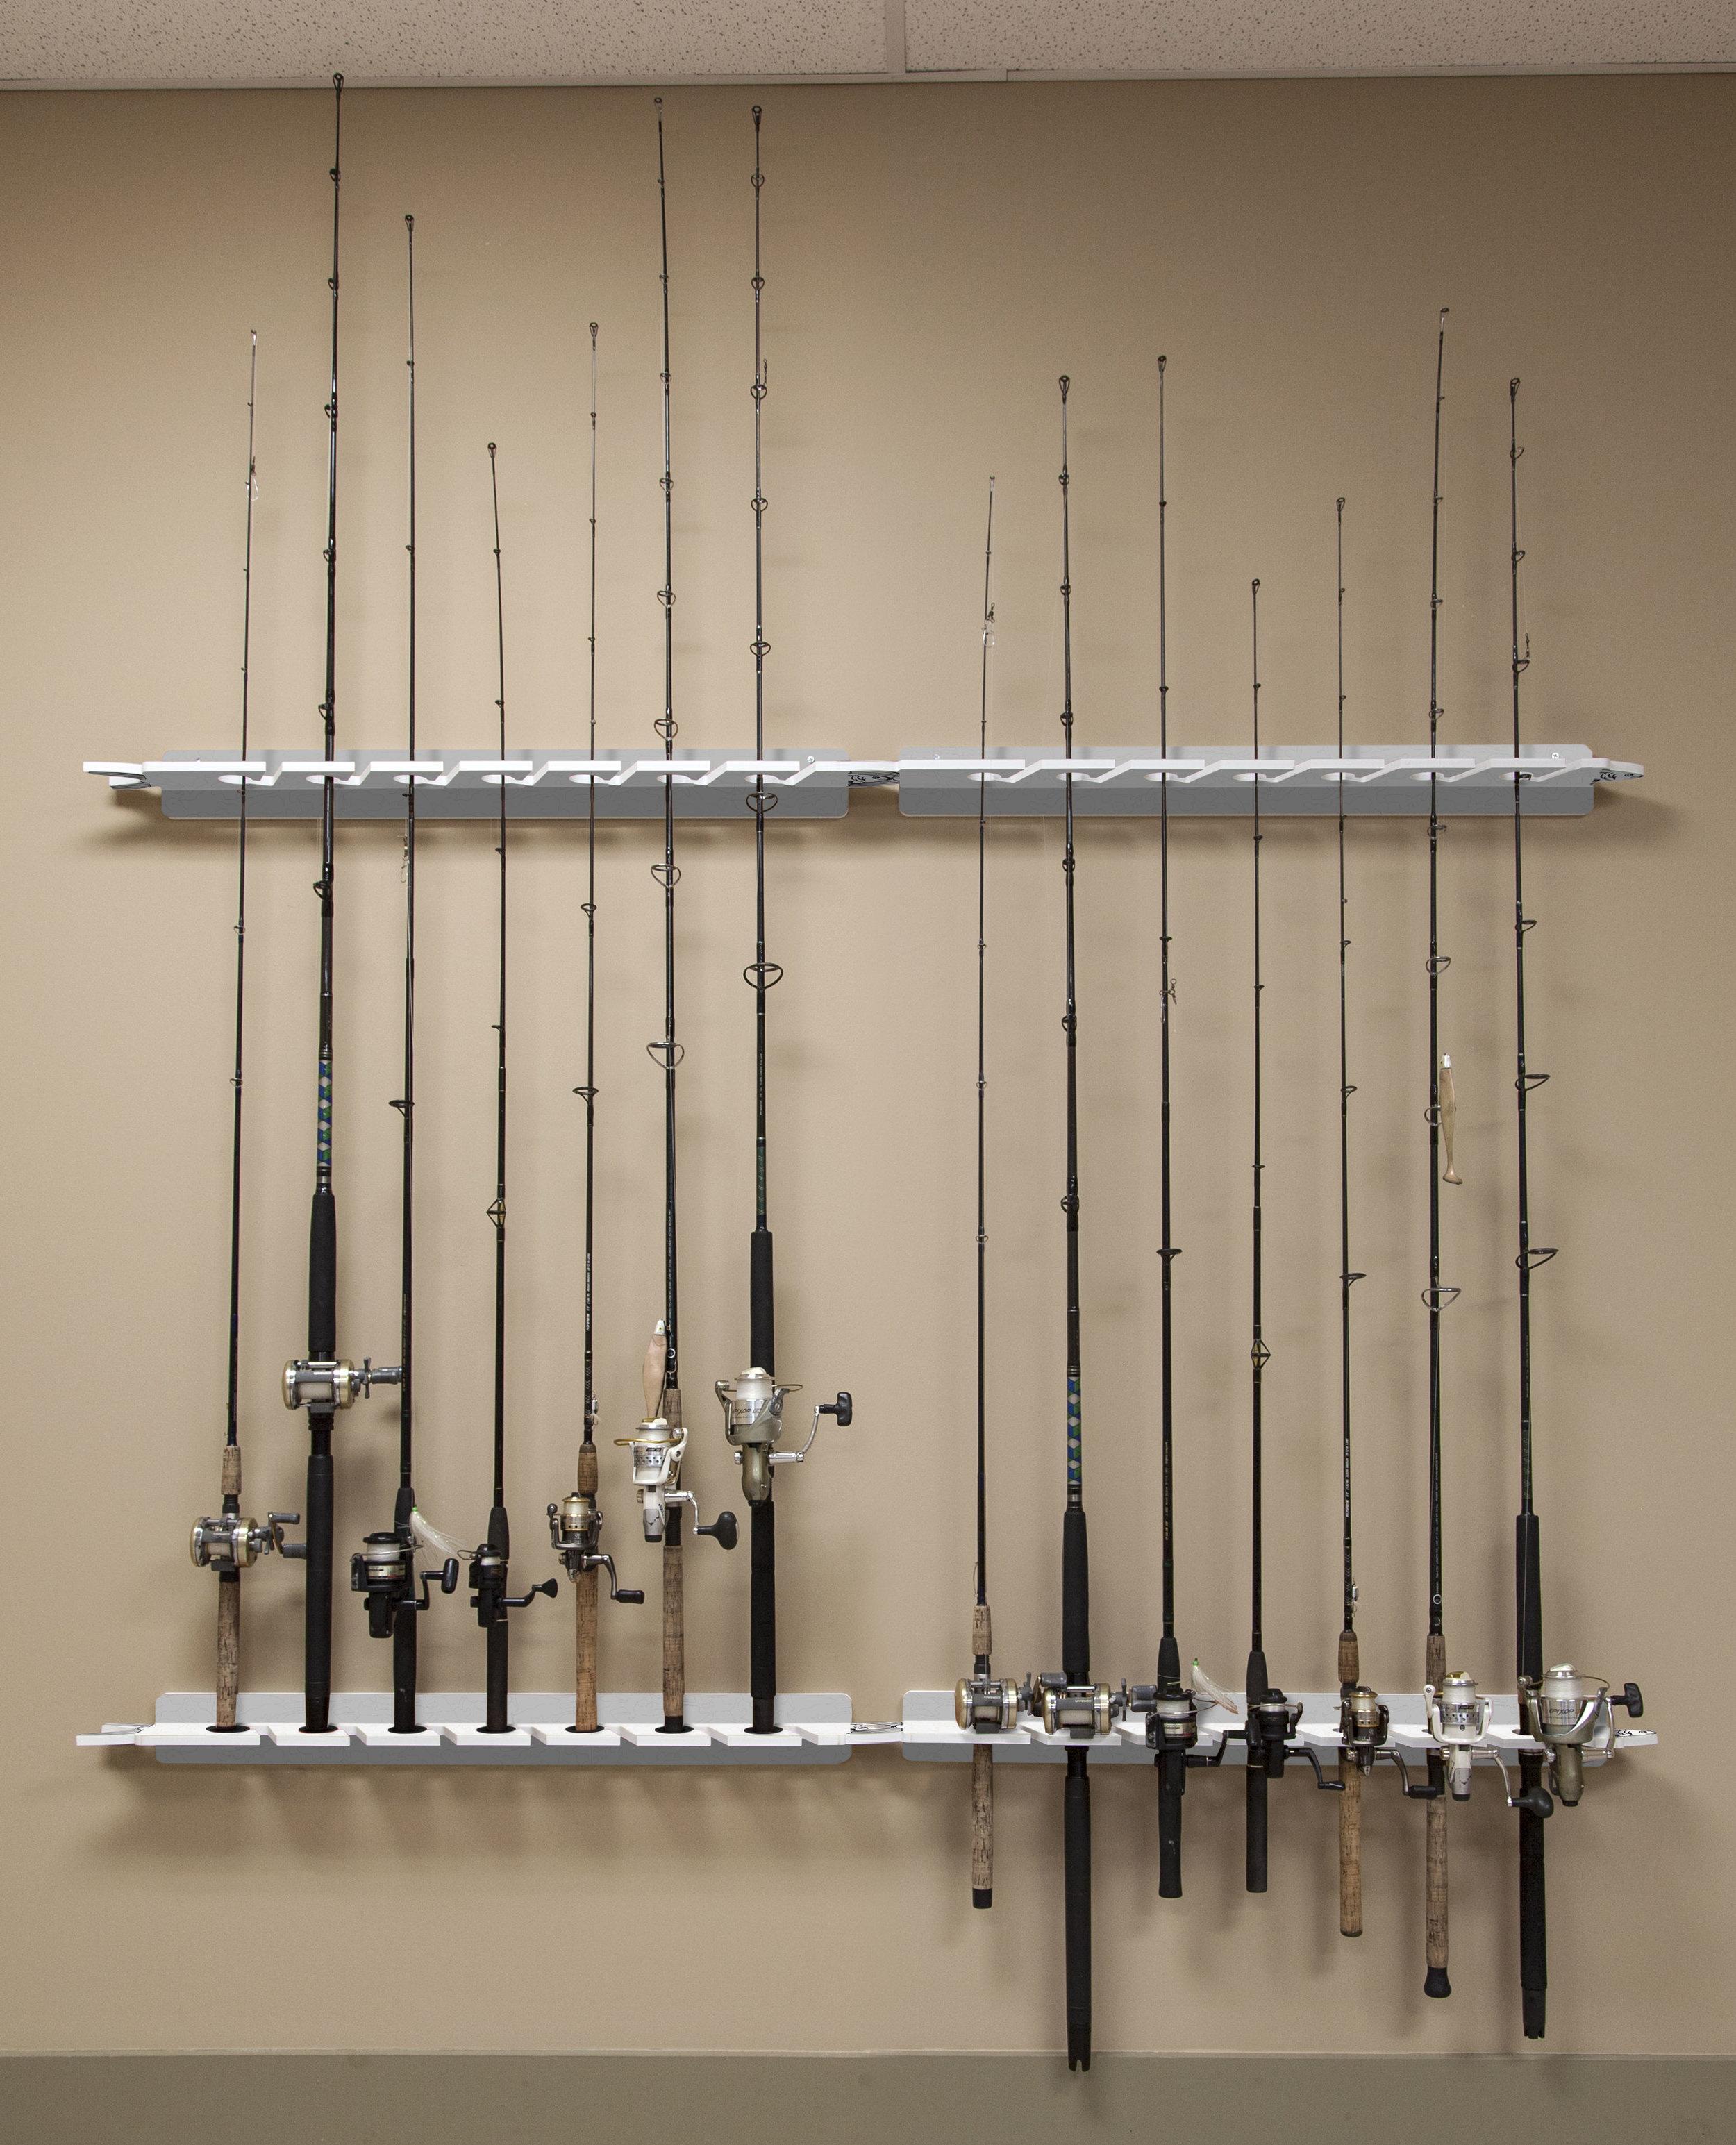 Fishing Rod Storage 11-Holder Camo Ceiling Mount Pole Reel Garage Organizer